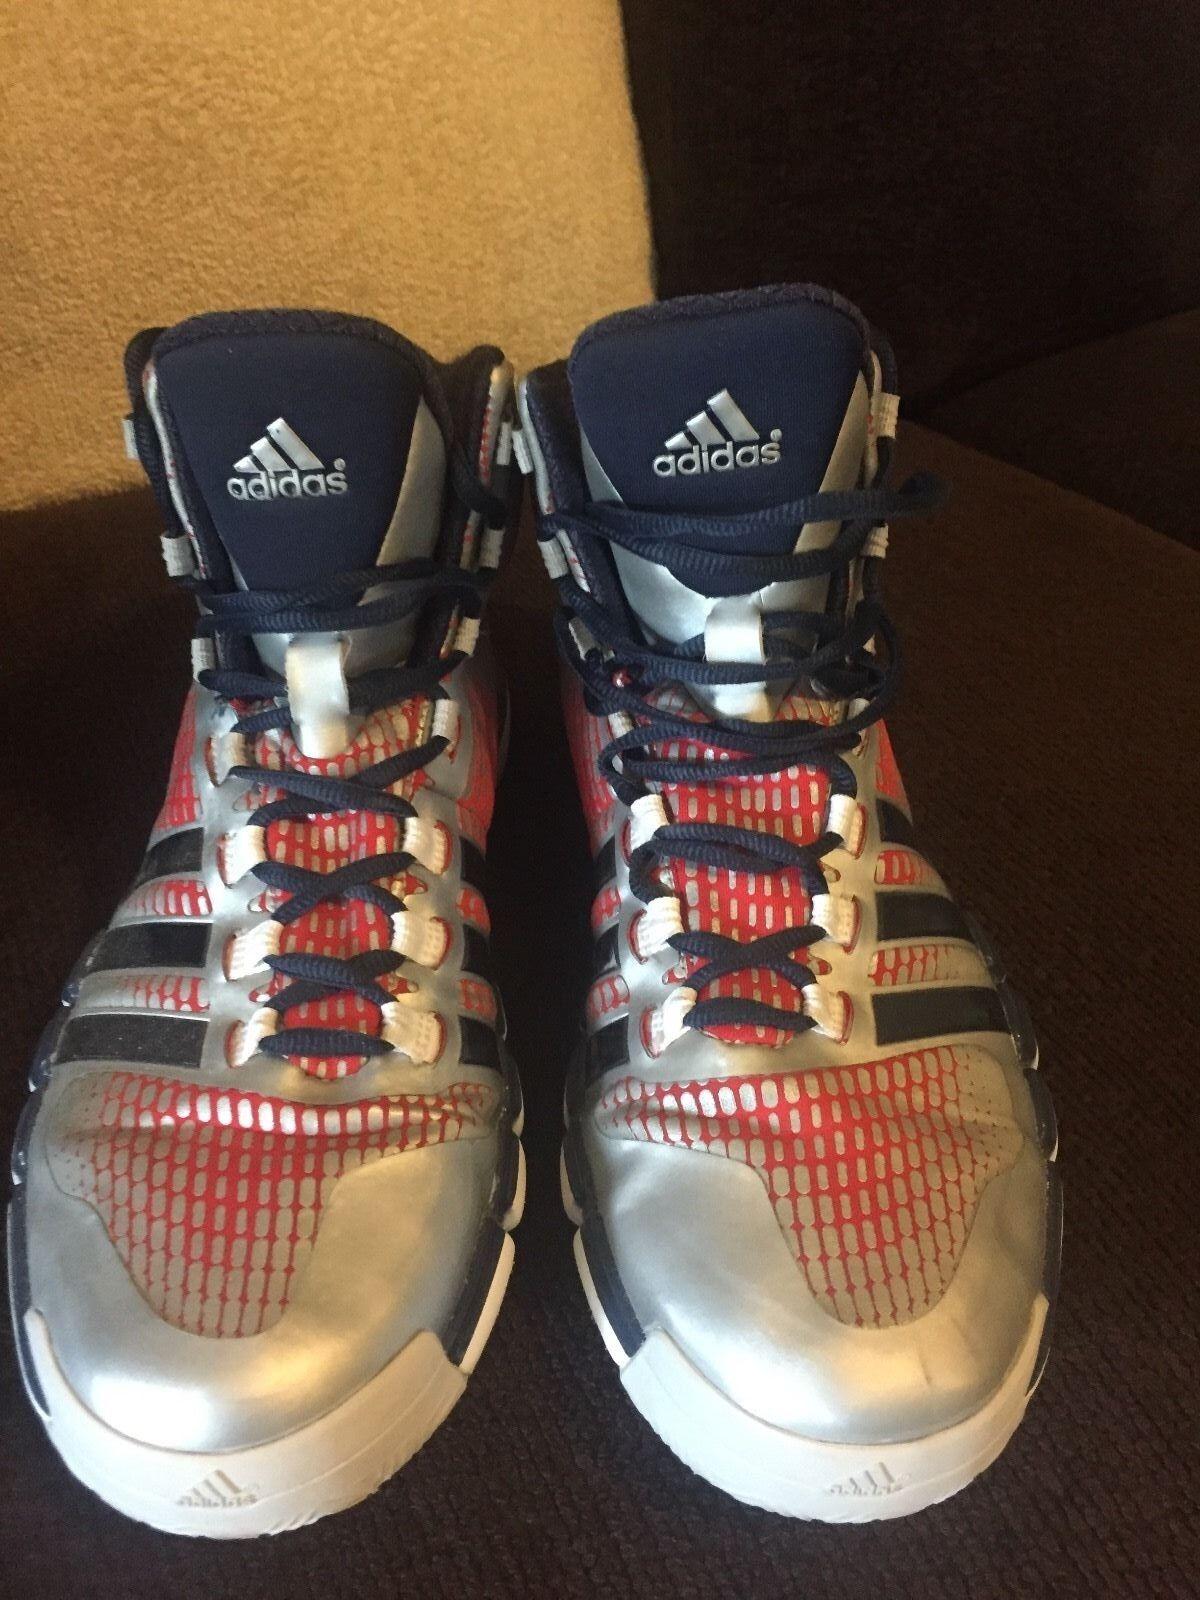 Adidas john wall crazyquick silver / da blu / rosso, scarpe da / basket 3a0cd4